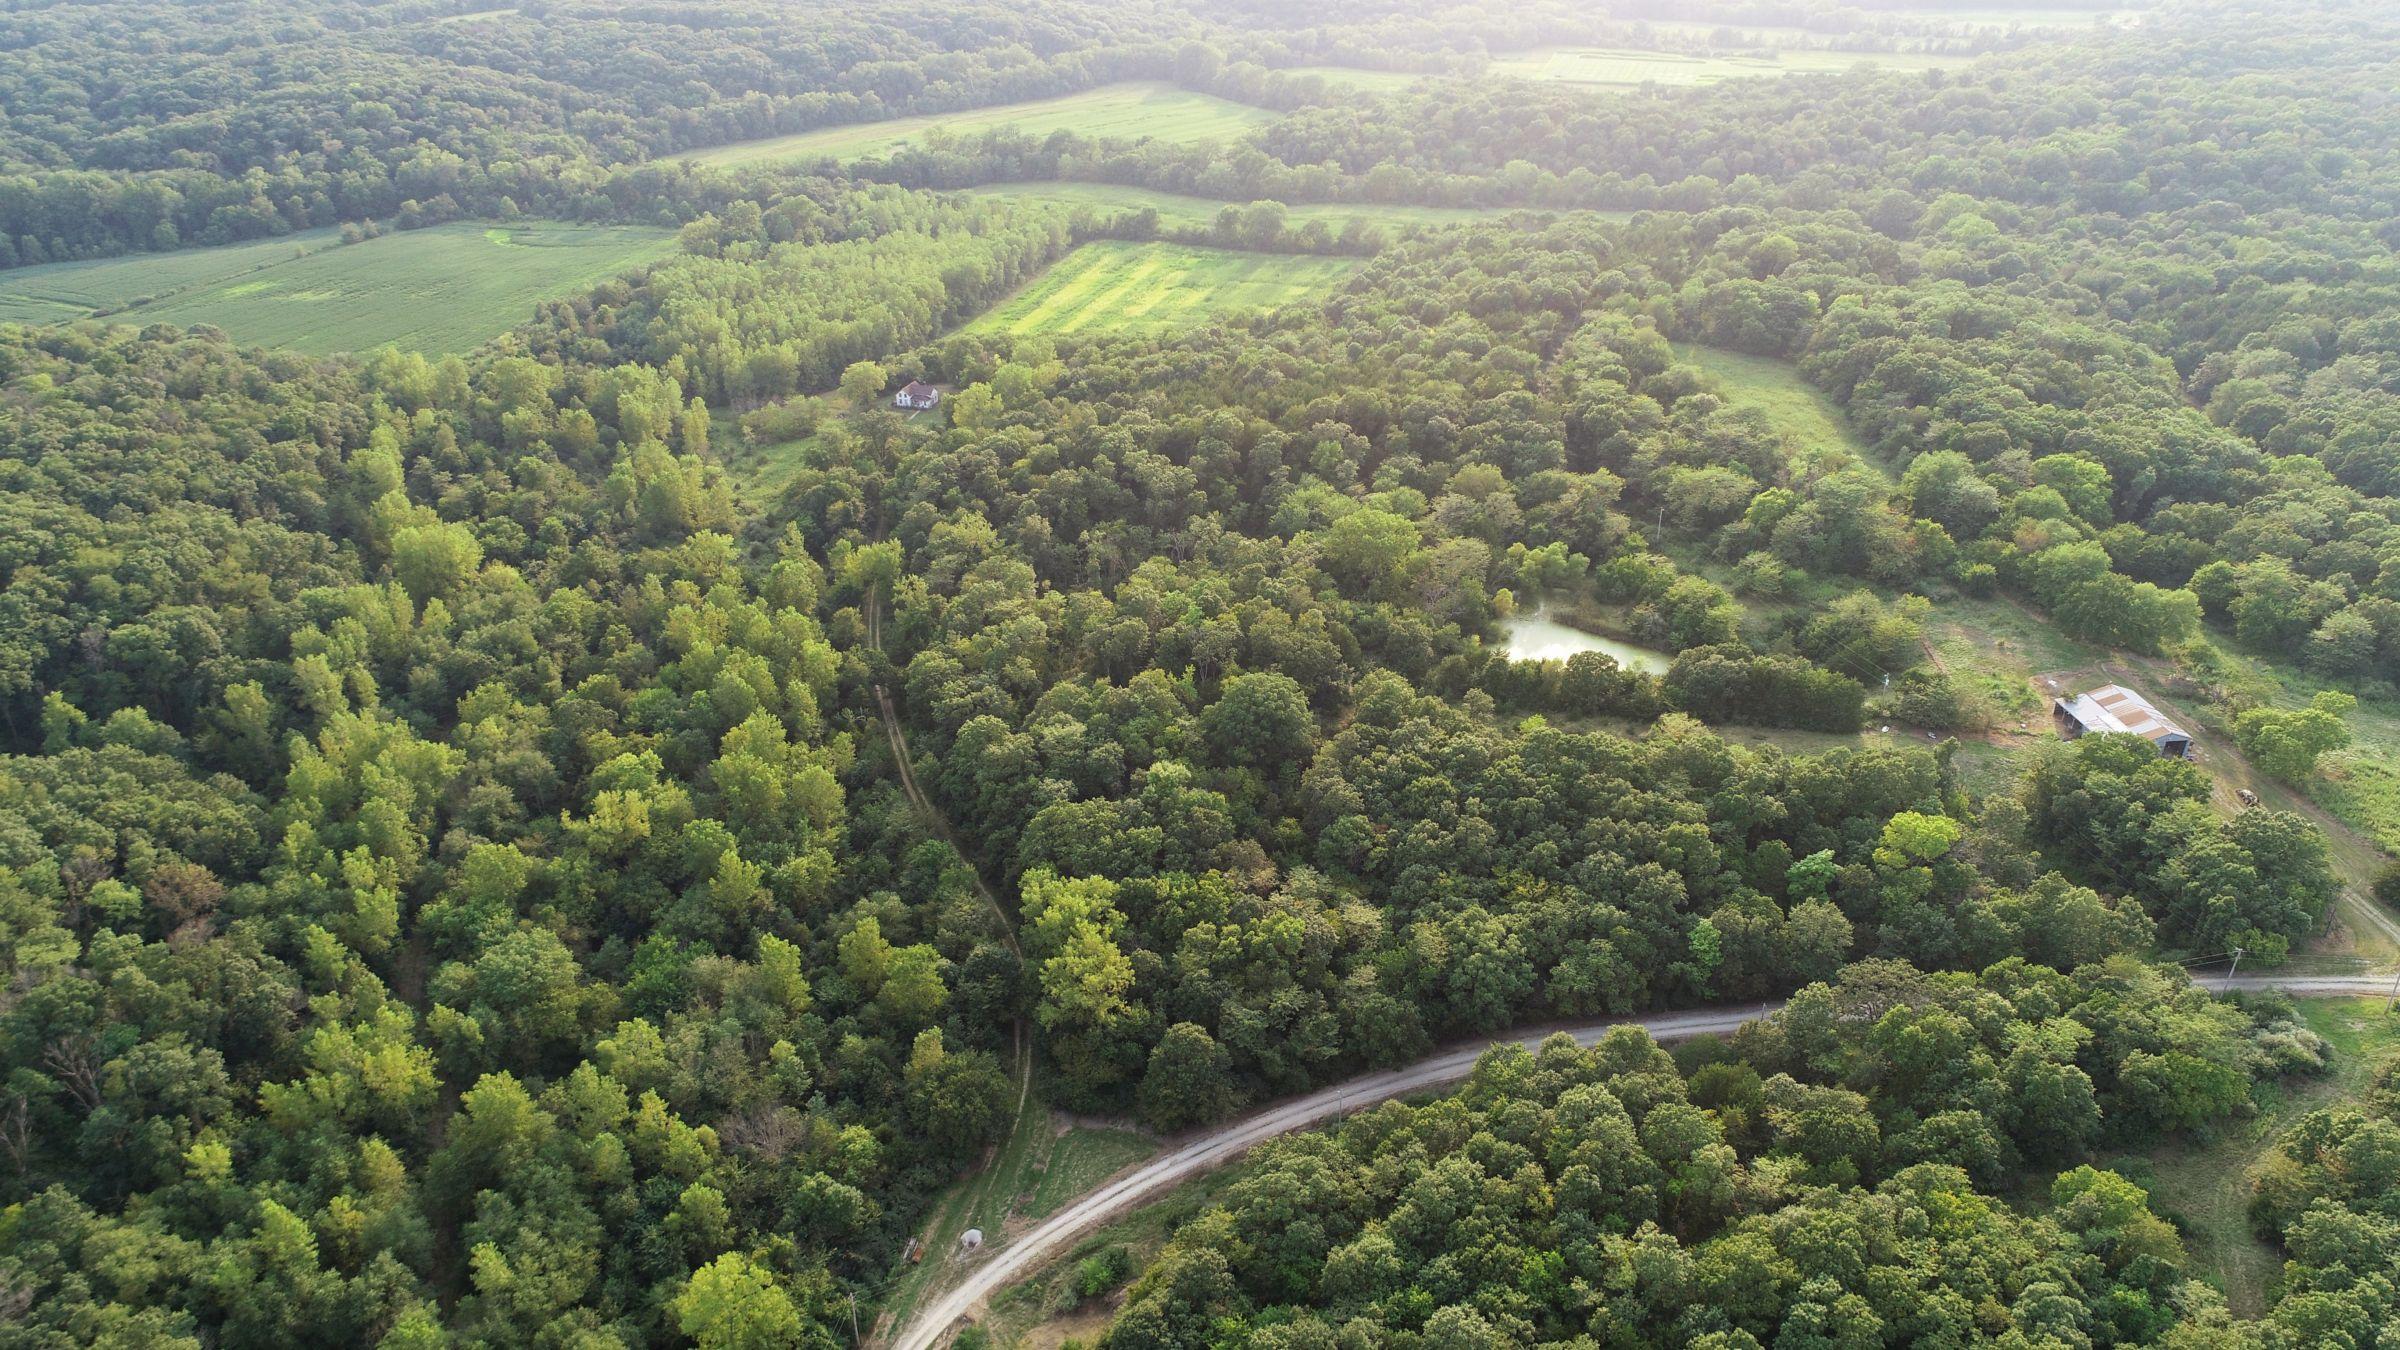 land-lee-county-iowa-328-acres-listing-number-15137-4-2020-08-27-175033.jpg